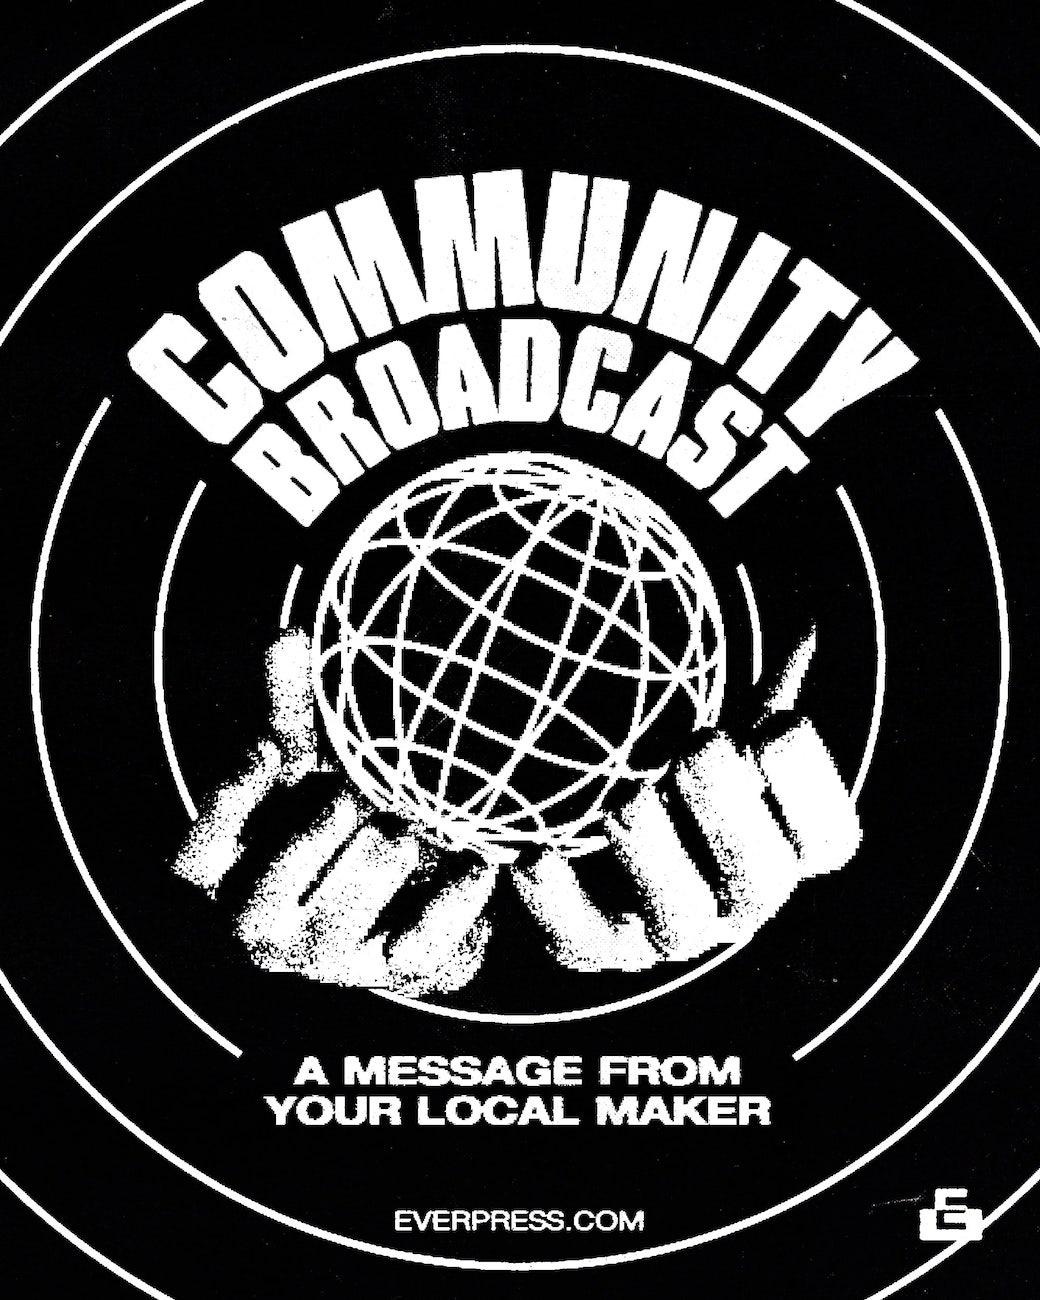 Everpress-Community-Broadcast-Black-Portrait-01